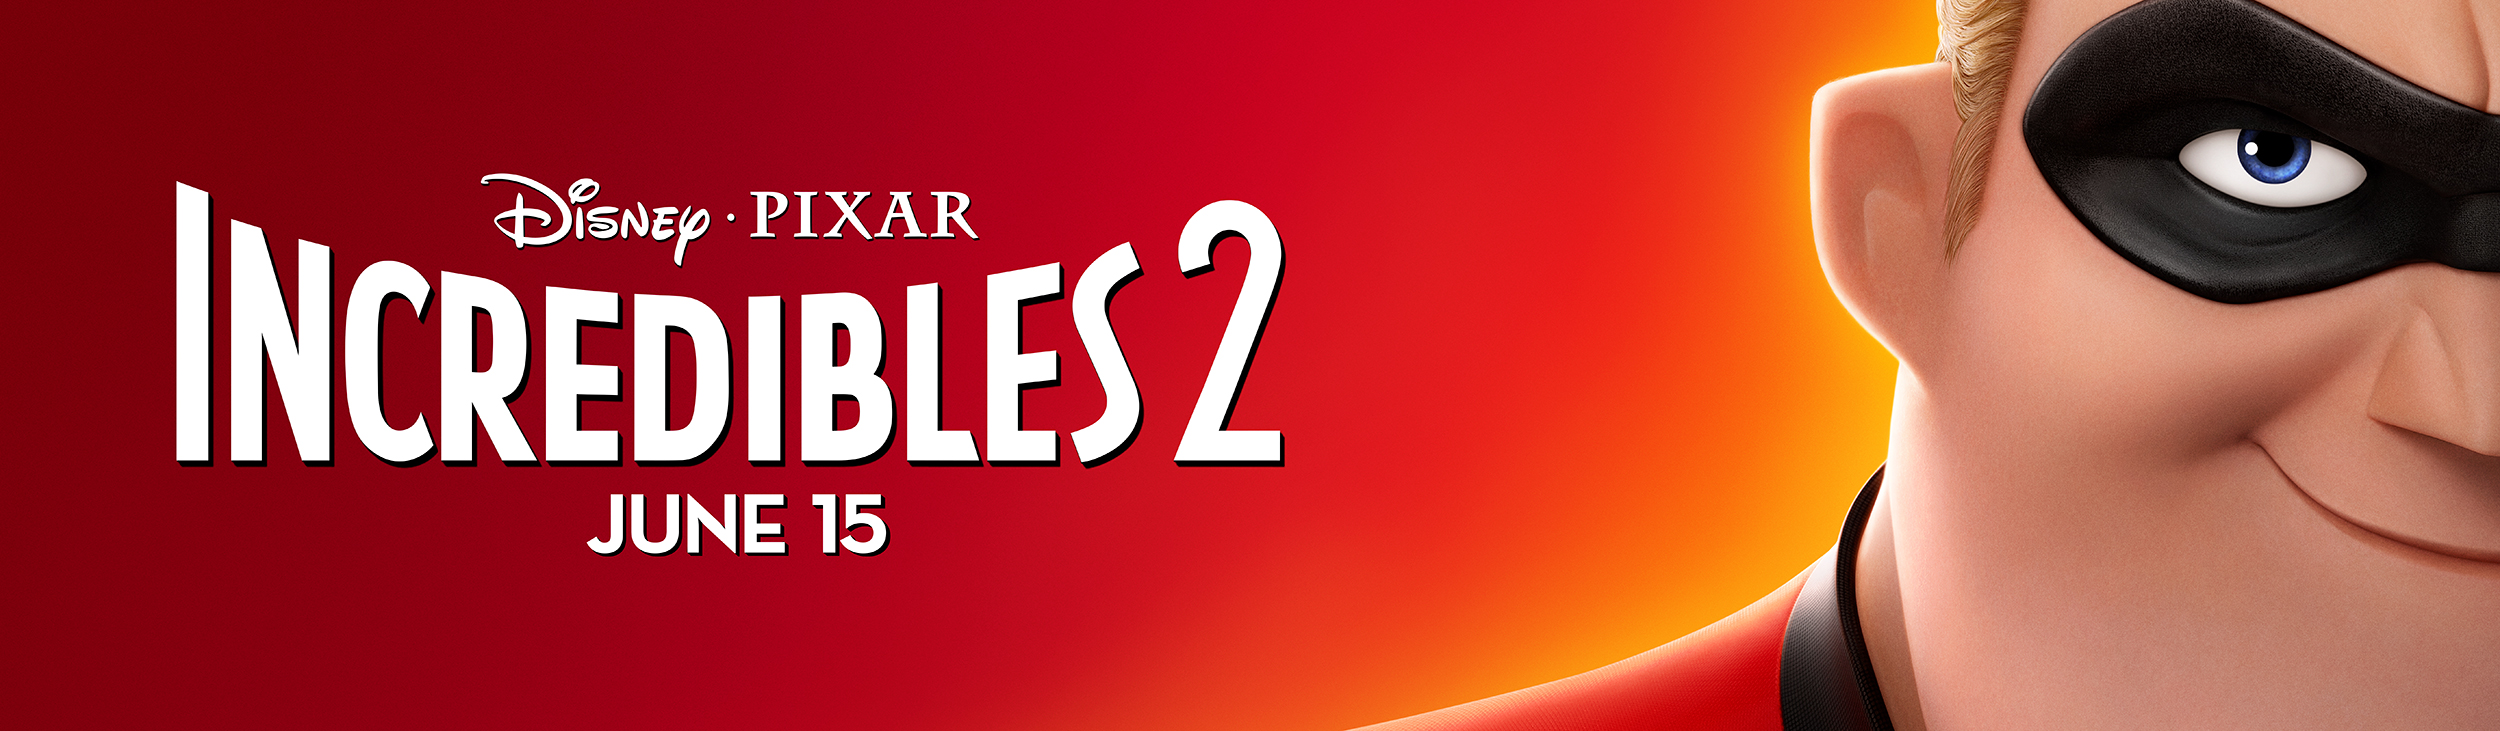 Incredibles 2 | Bob Billboard Concept, Finishing & Illustration